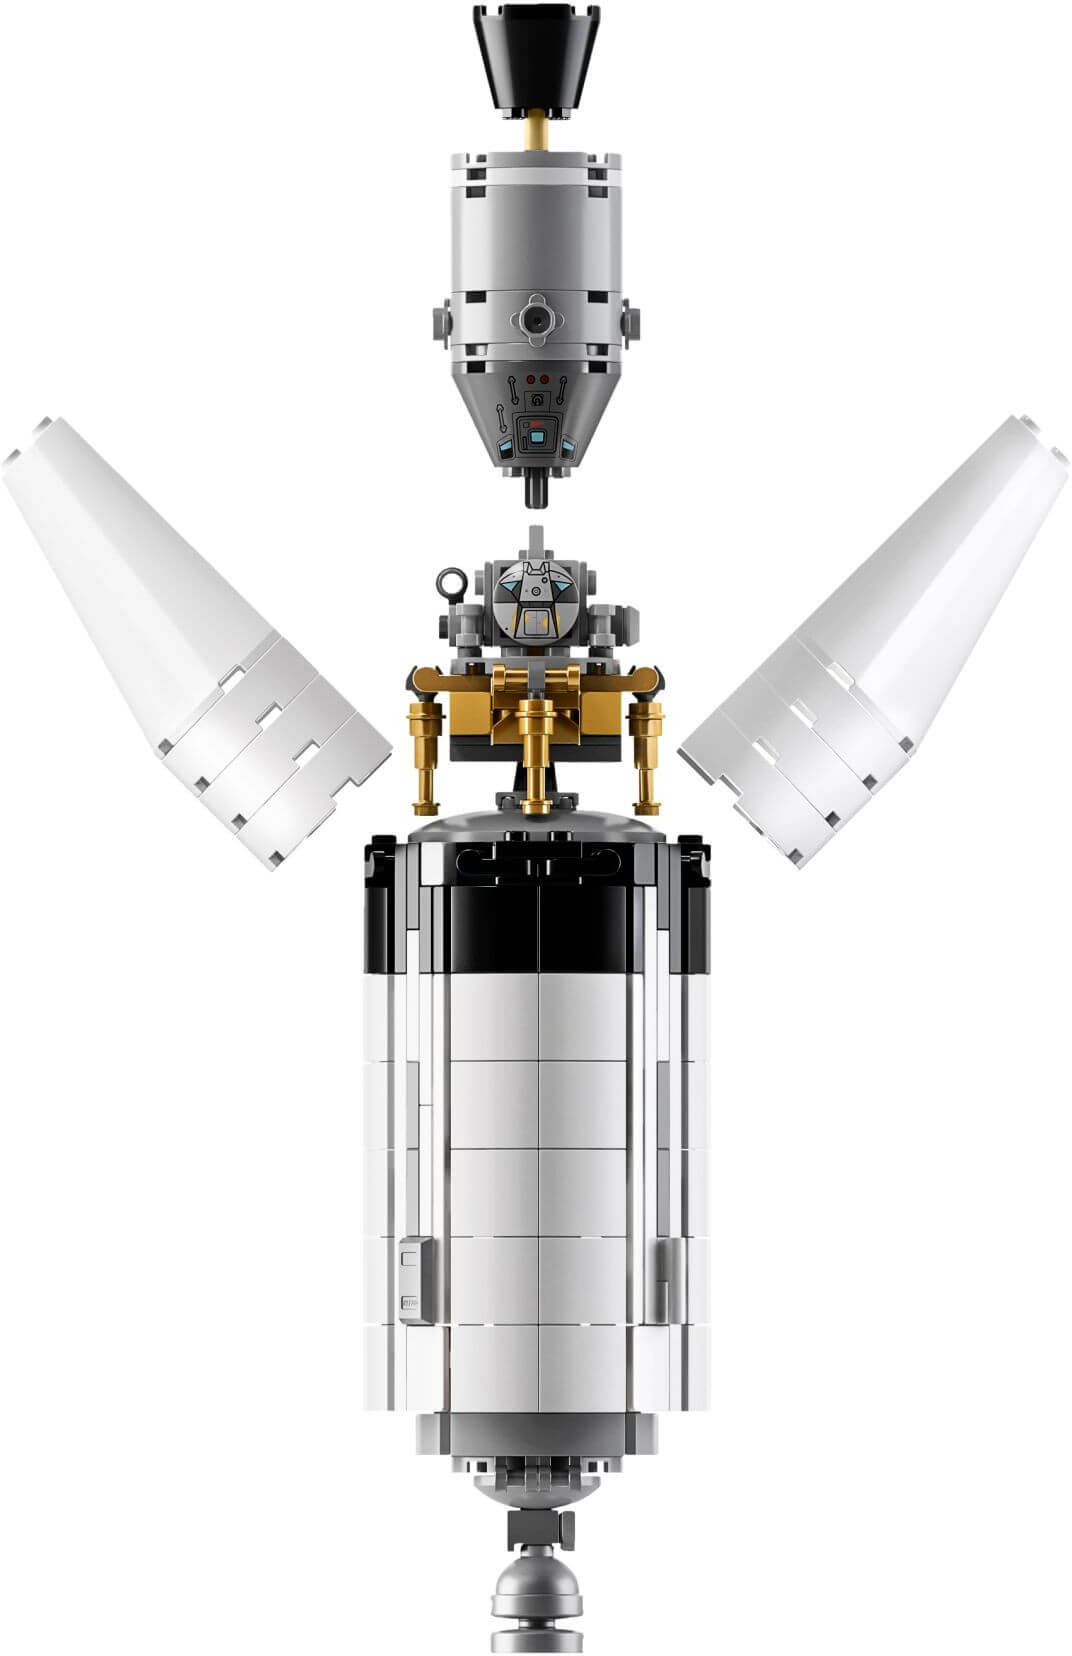 Mua đồ chơi LEGO 21309 - LEGO Ideas 21309 - Tên Lửa Apollo Saturn V phóng lên Mặt Trăng (LEGO Ideas NASA Apollo Saturn V)